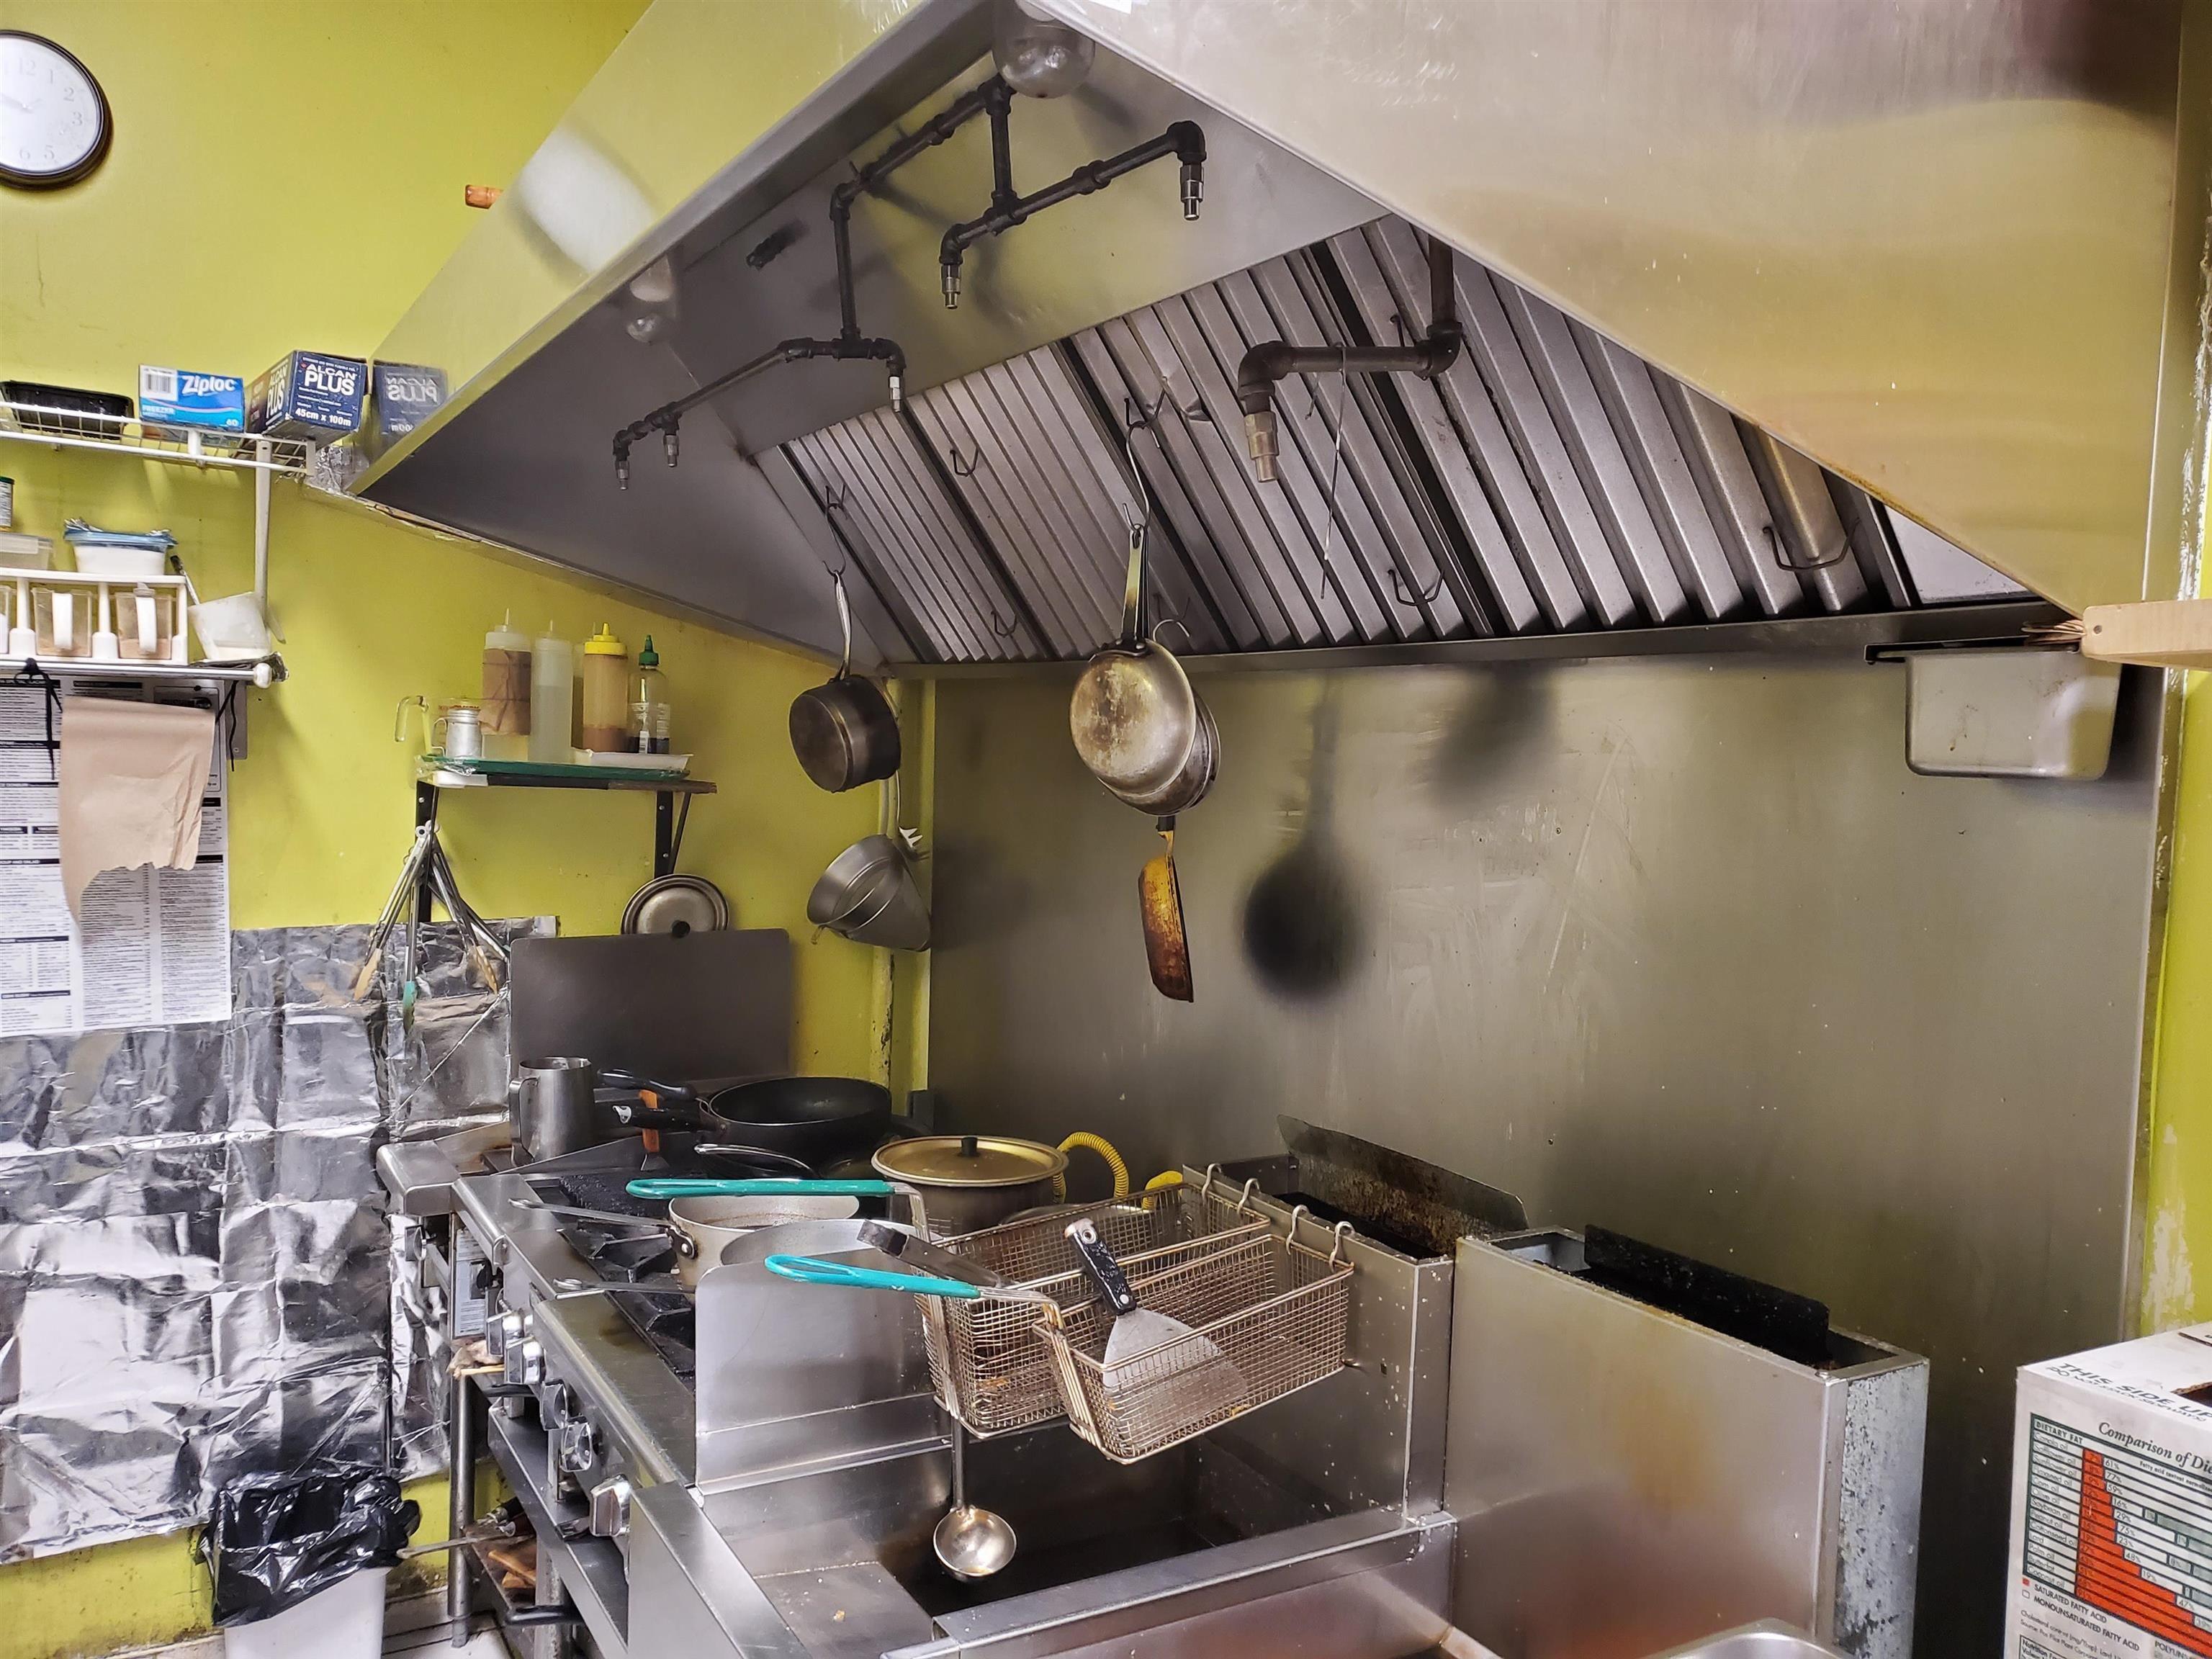 Main Photo: 841 CONFIDENTIAL in Surrey: Panorama Ridge Business for sale : MLS®# C8040007